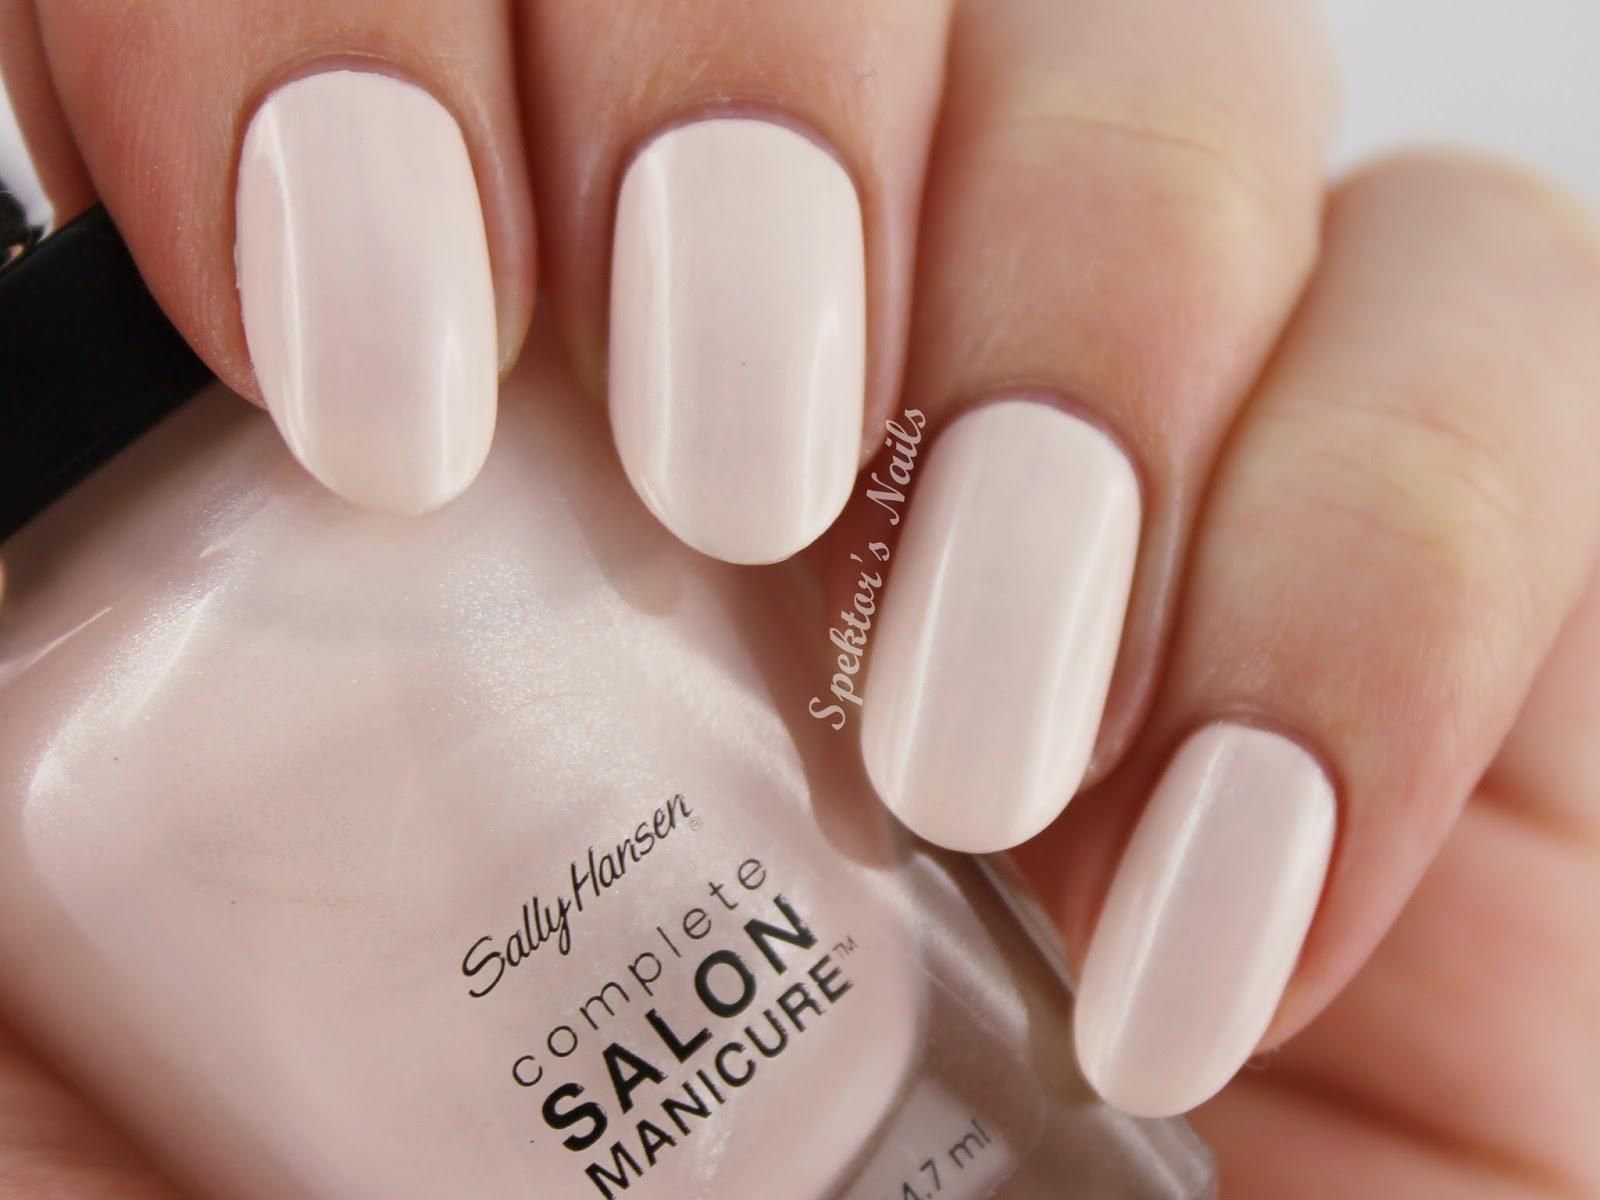 Sally Hansen - Designer Collection 2014 A Wink Of Pink